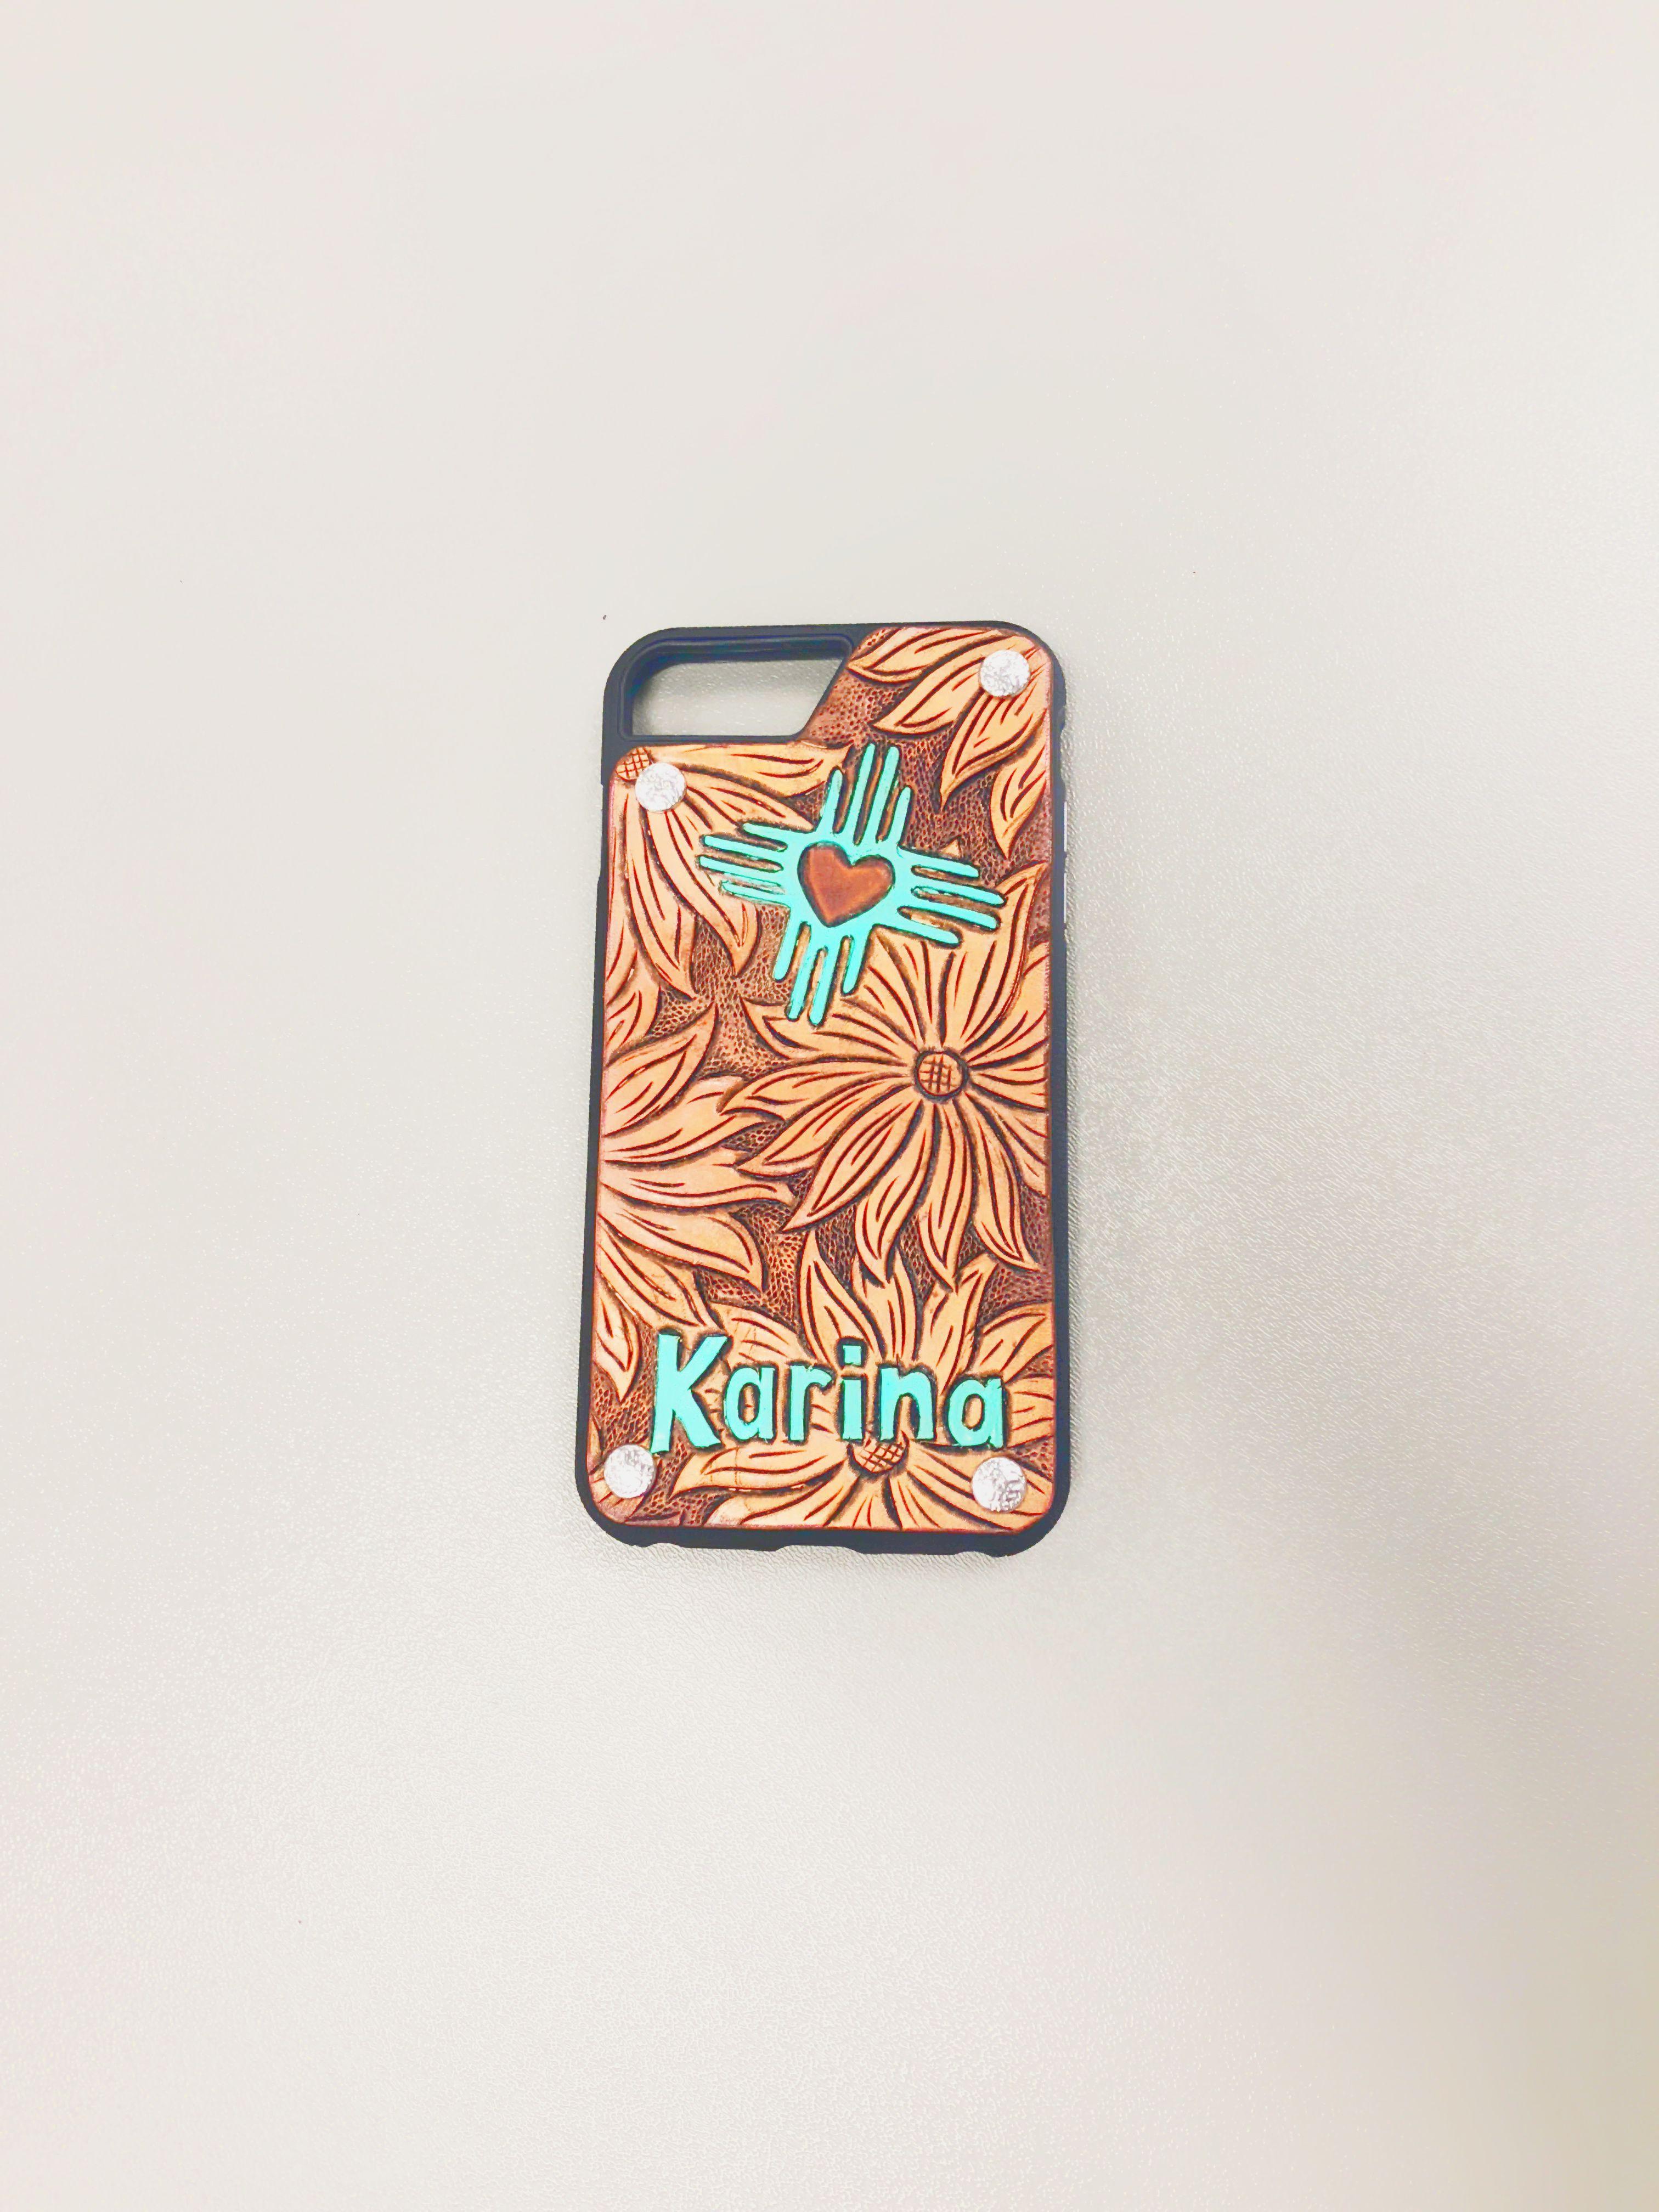 Custom tooled leather phone case made by rockin l custom